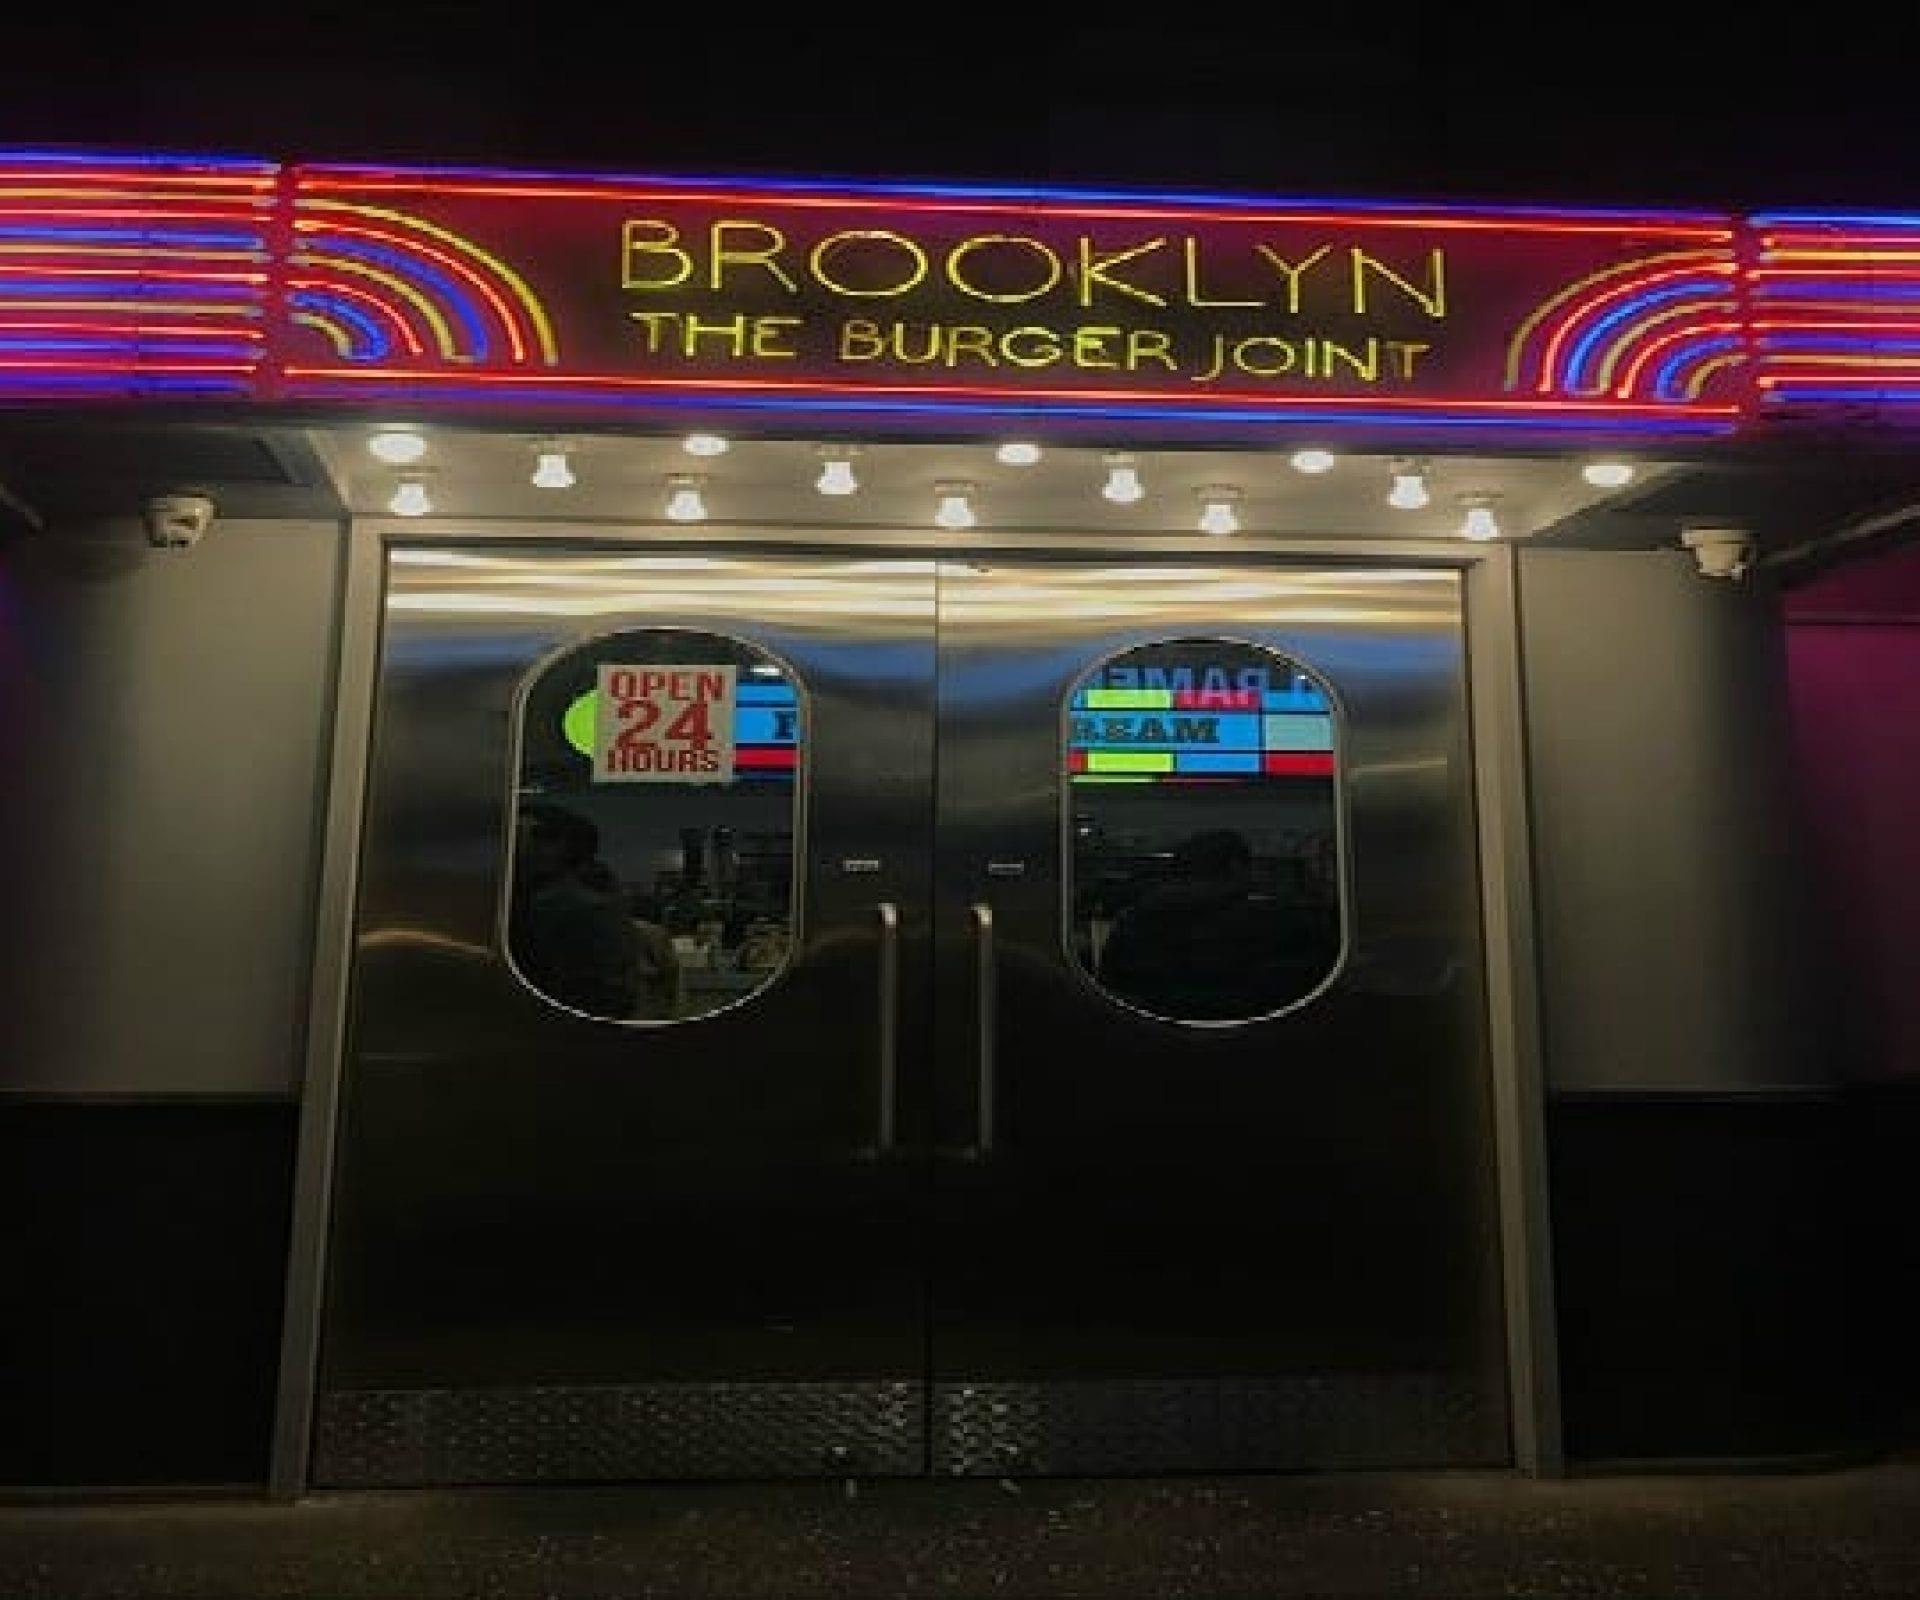 Brooklyn the Burger Joint | Gangnam-gu, Seoul